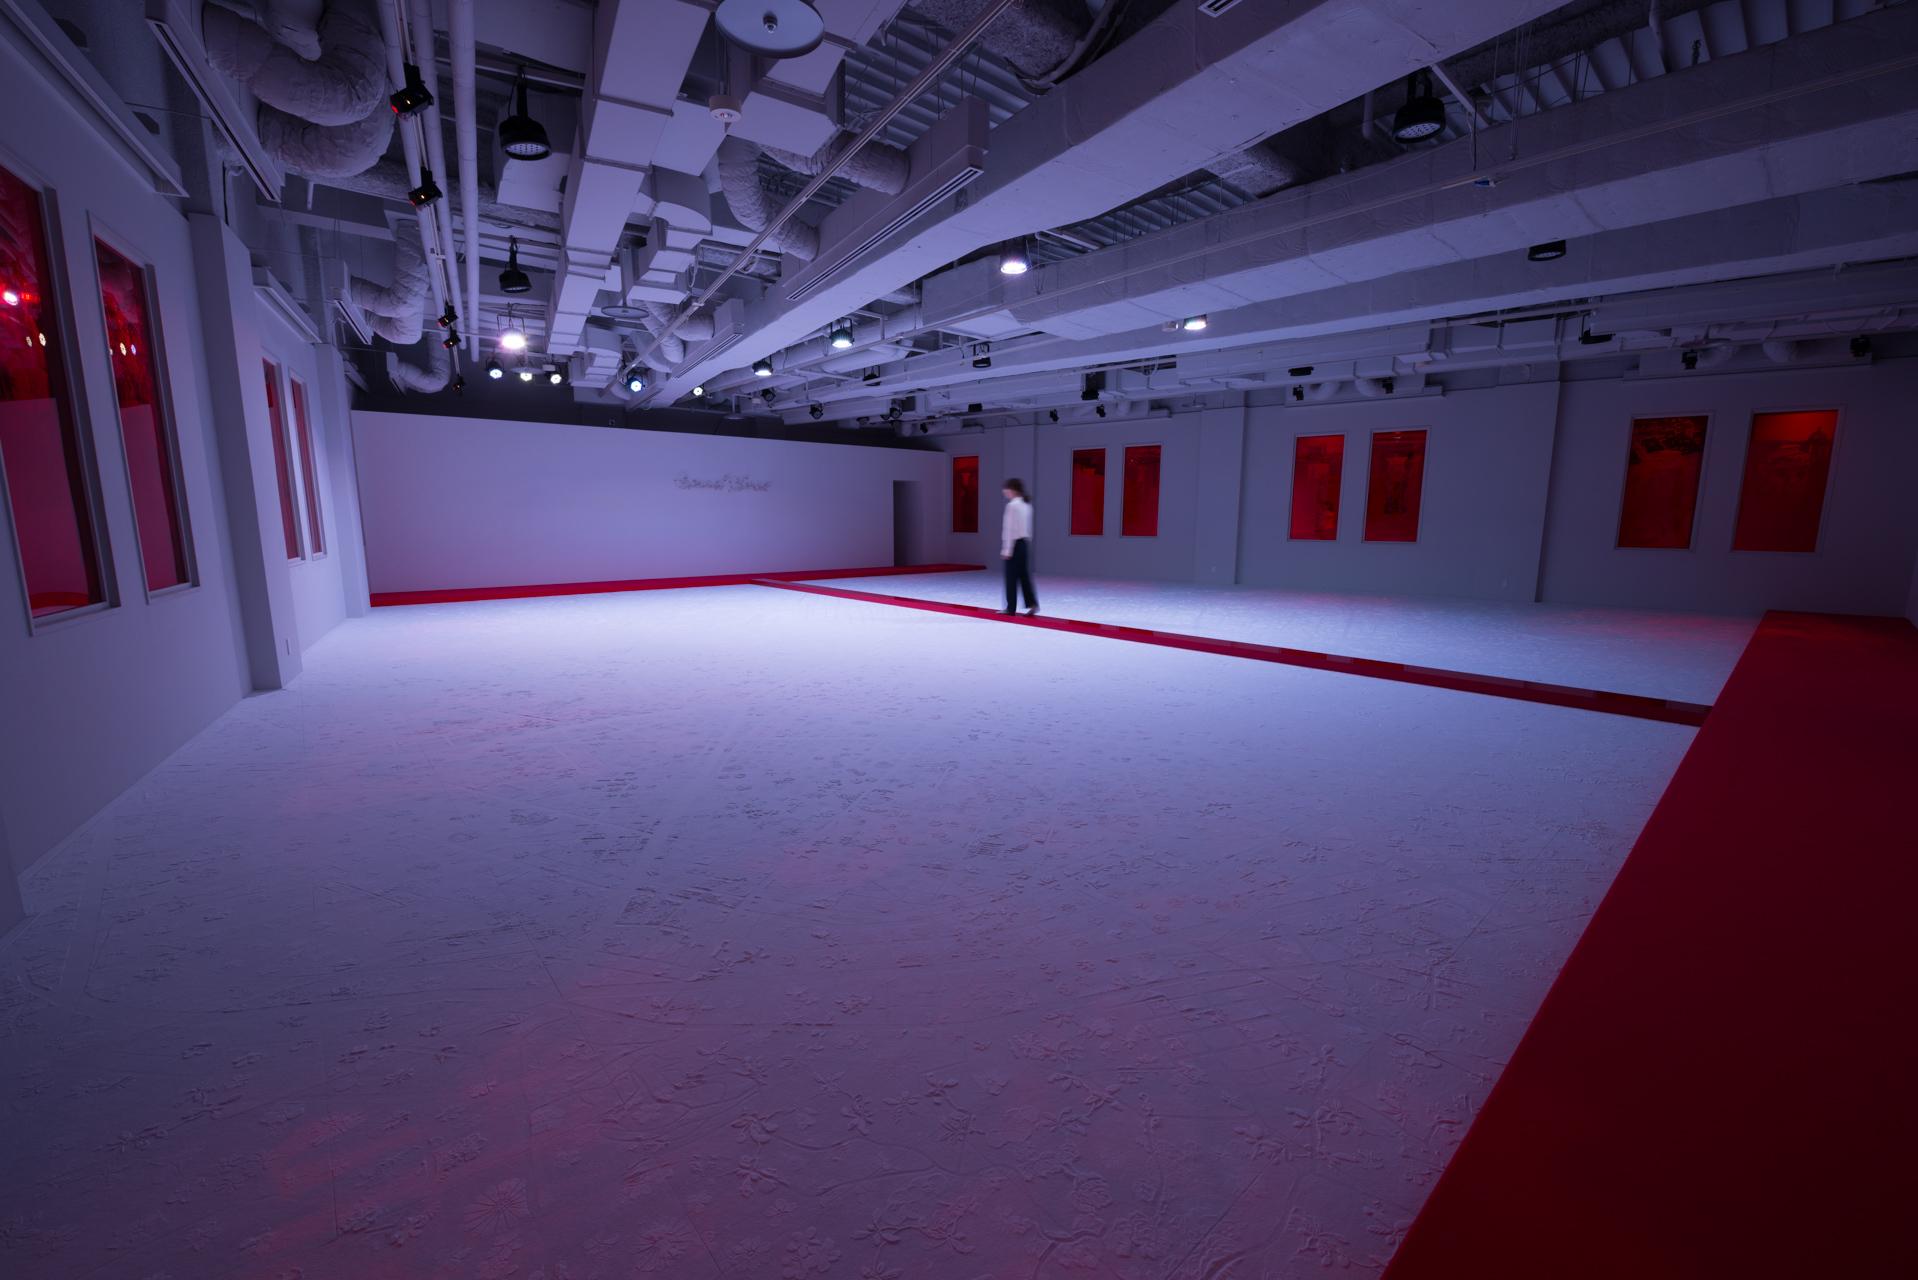 大巻伸嗣 / Shinji Ohmaki《Echoes - Genius Loci》2017 Material: felt, crystal pigments, mirror, acrylic, etc  Size: w16 × d13 × h3.2 (m)   Photo: Ken KATO